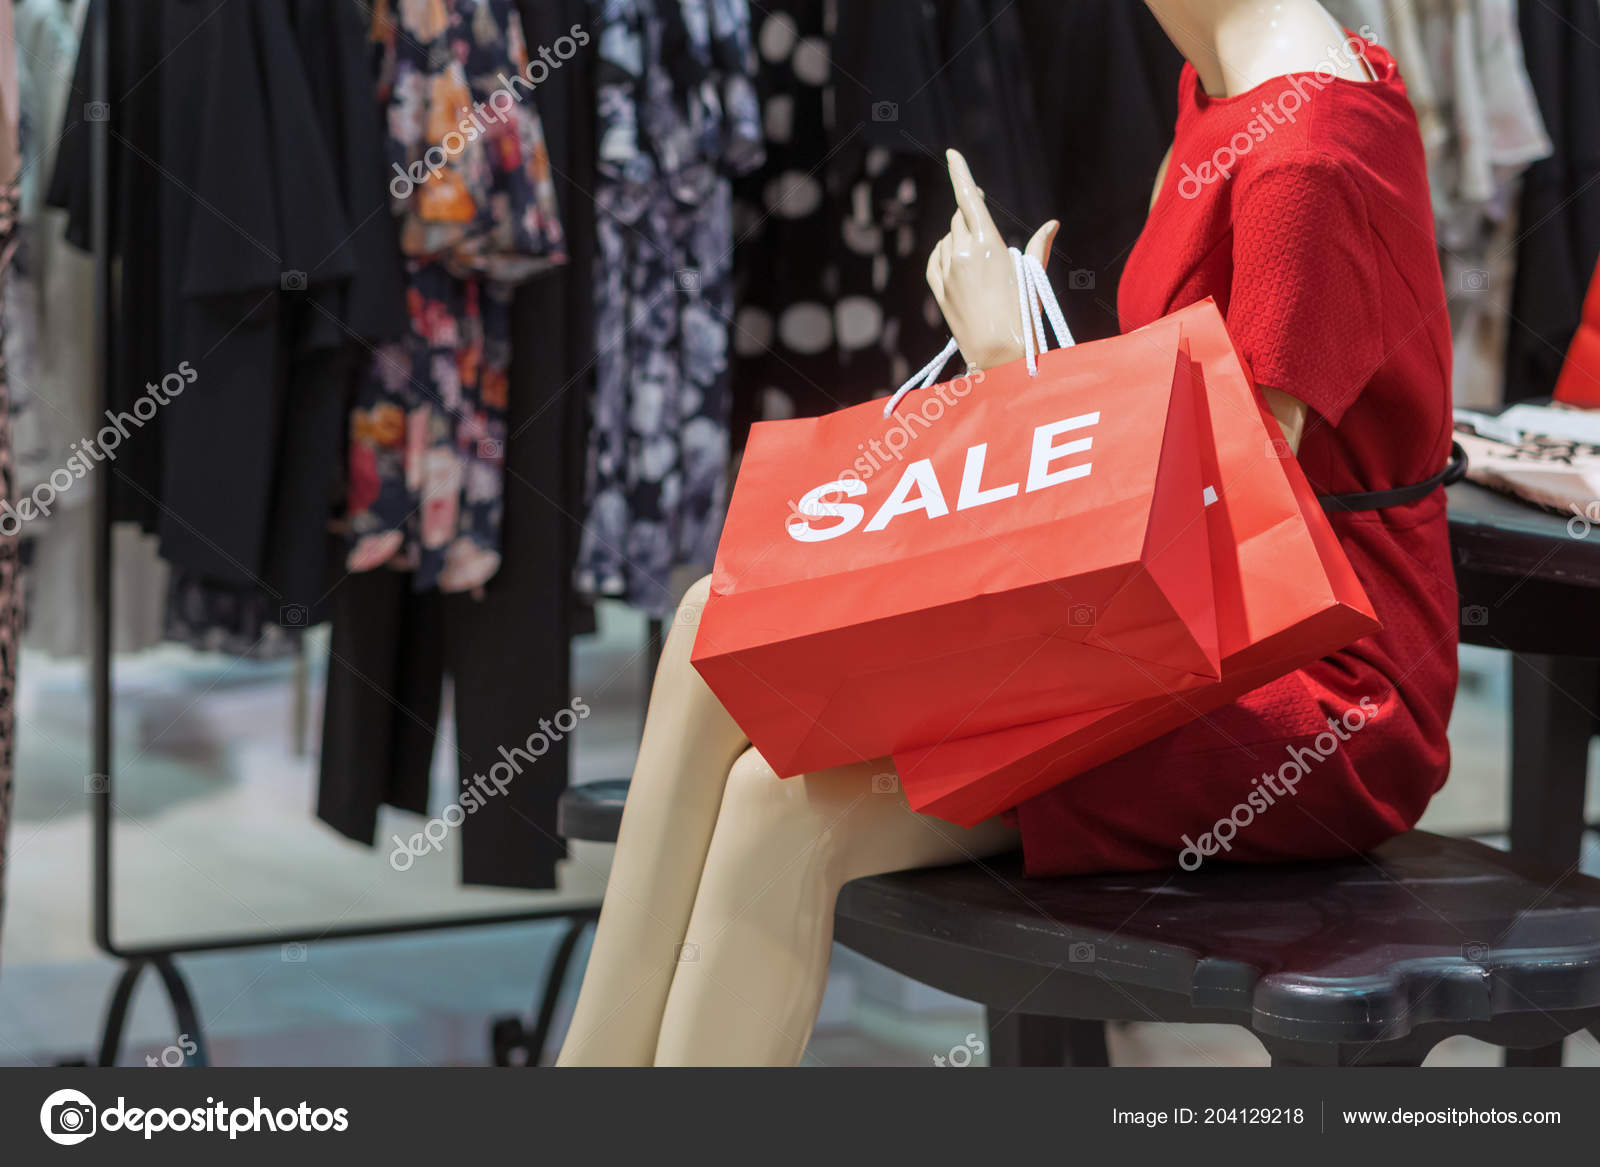 4a3d35e165 Parte Del Maniquí Vestido Con Ropa Casual Con Bolso Compras — Fotos de Stock